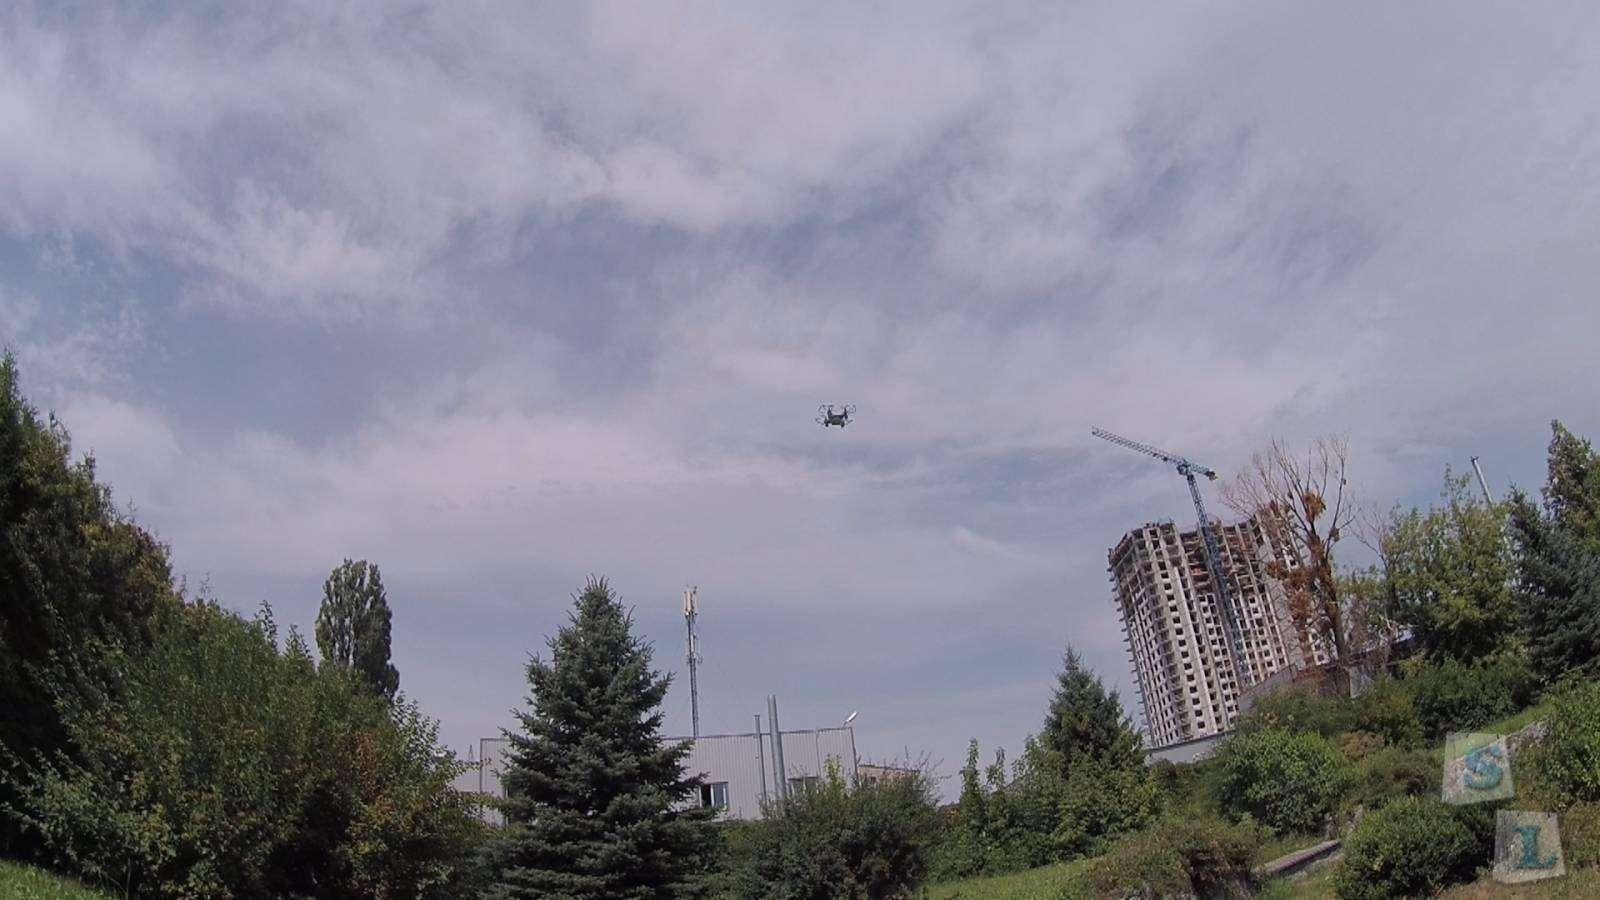 CooliCool: JJRC JJ-810 2.4GHz, 4Ch, 6 Axis Gyro, mini RC Quadcopter (RTF)